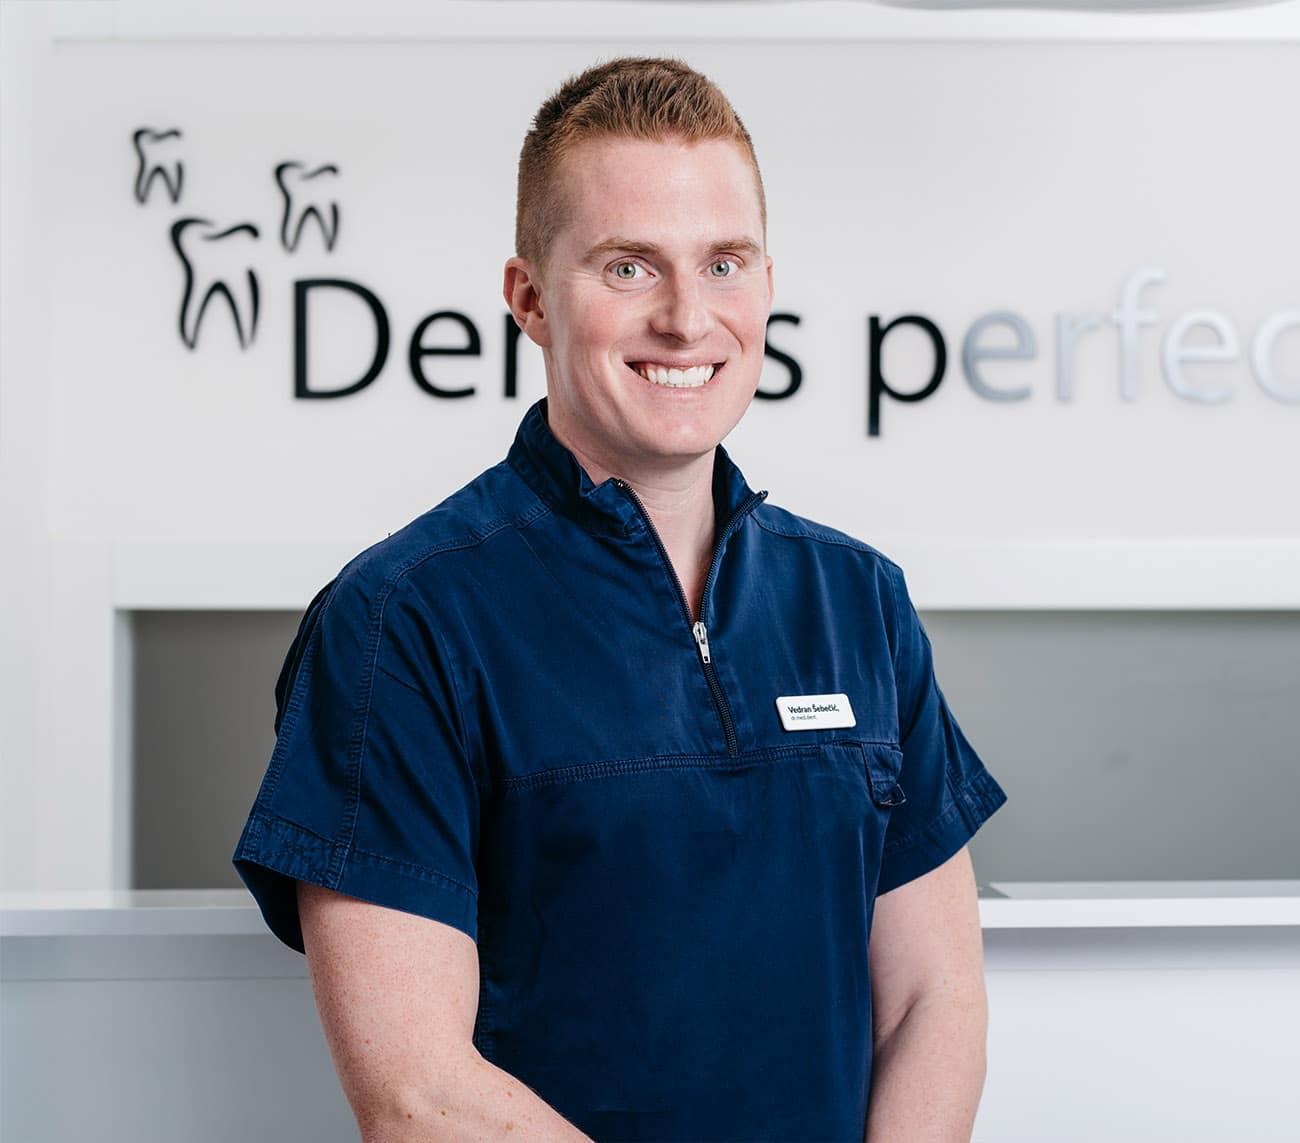 Dentus Perfectus ordinacija - jamstvo kvalitete